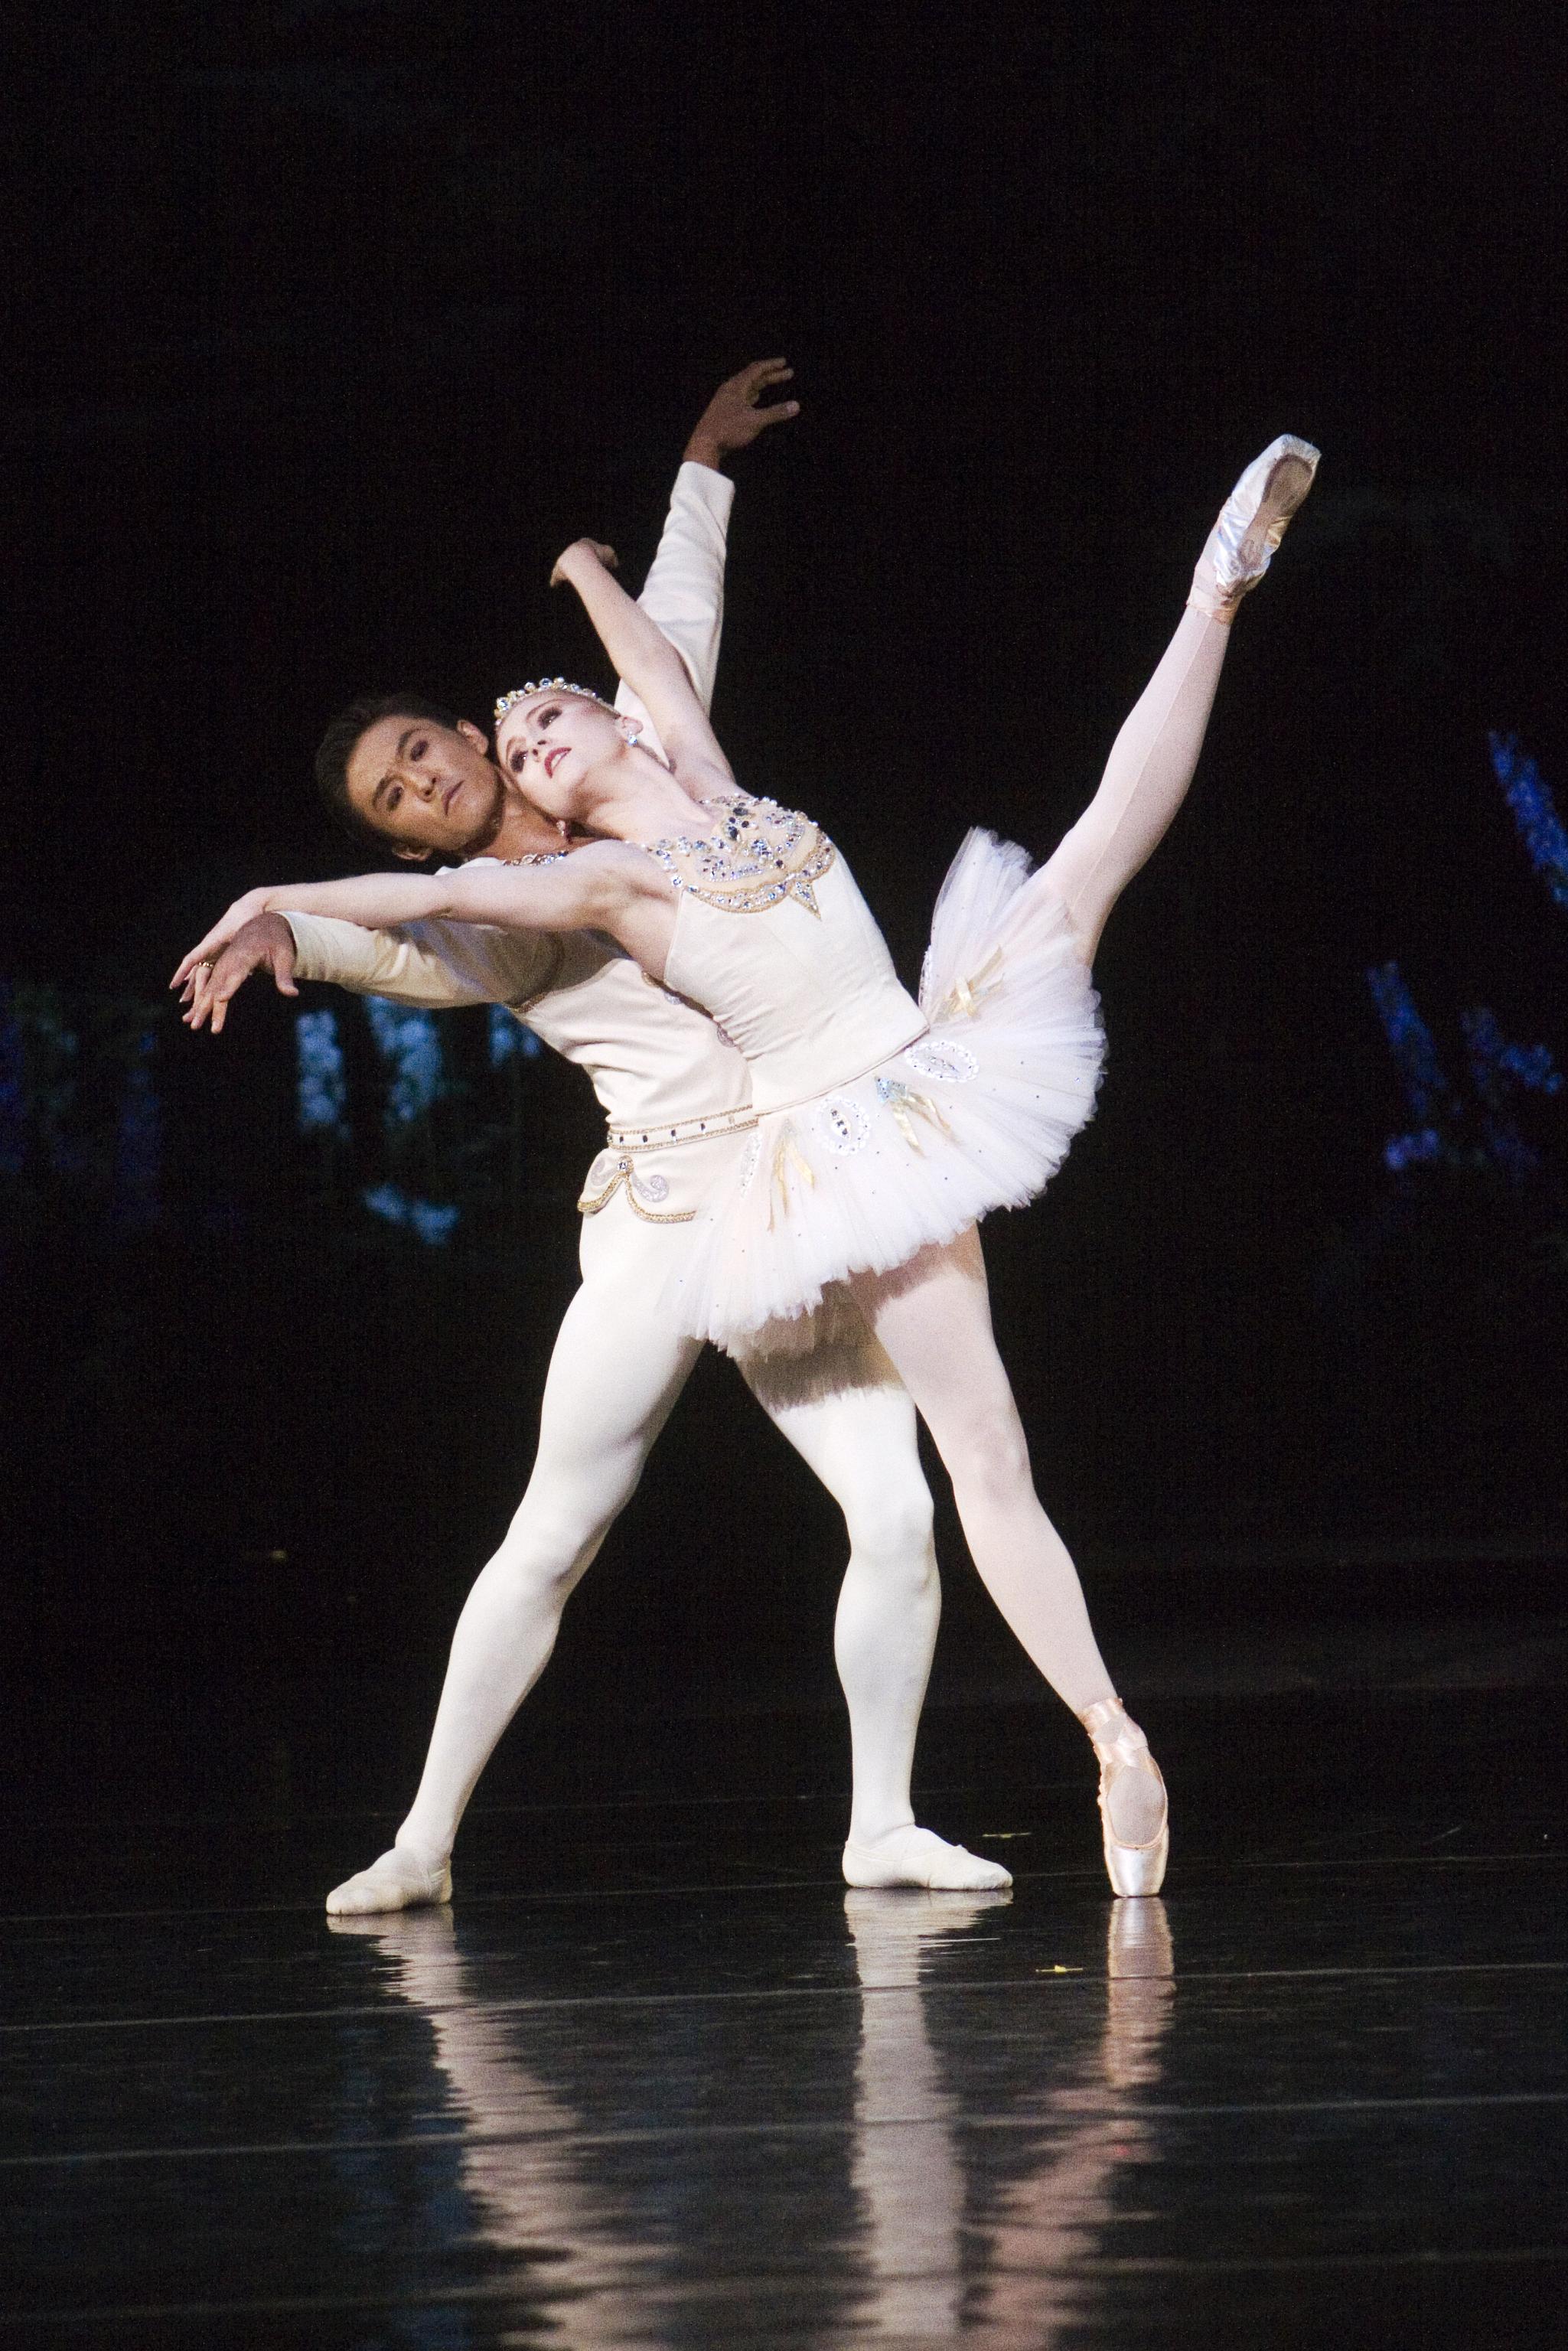 Ballet Dancers At The Vail International Dance Festival